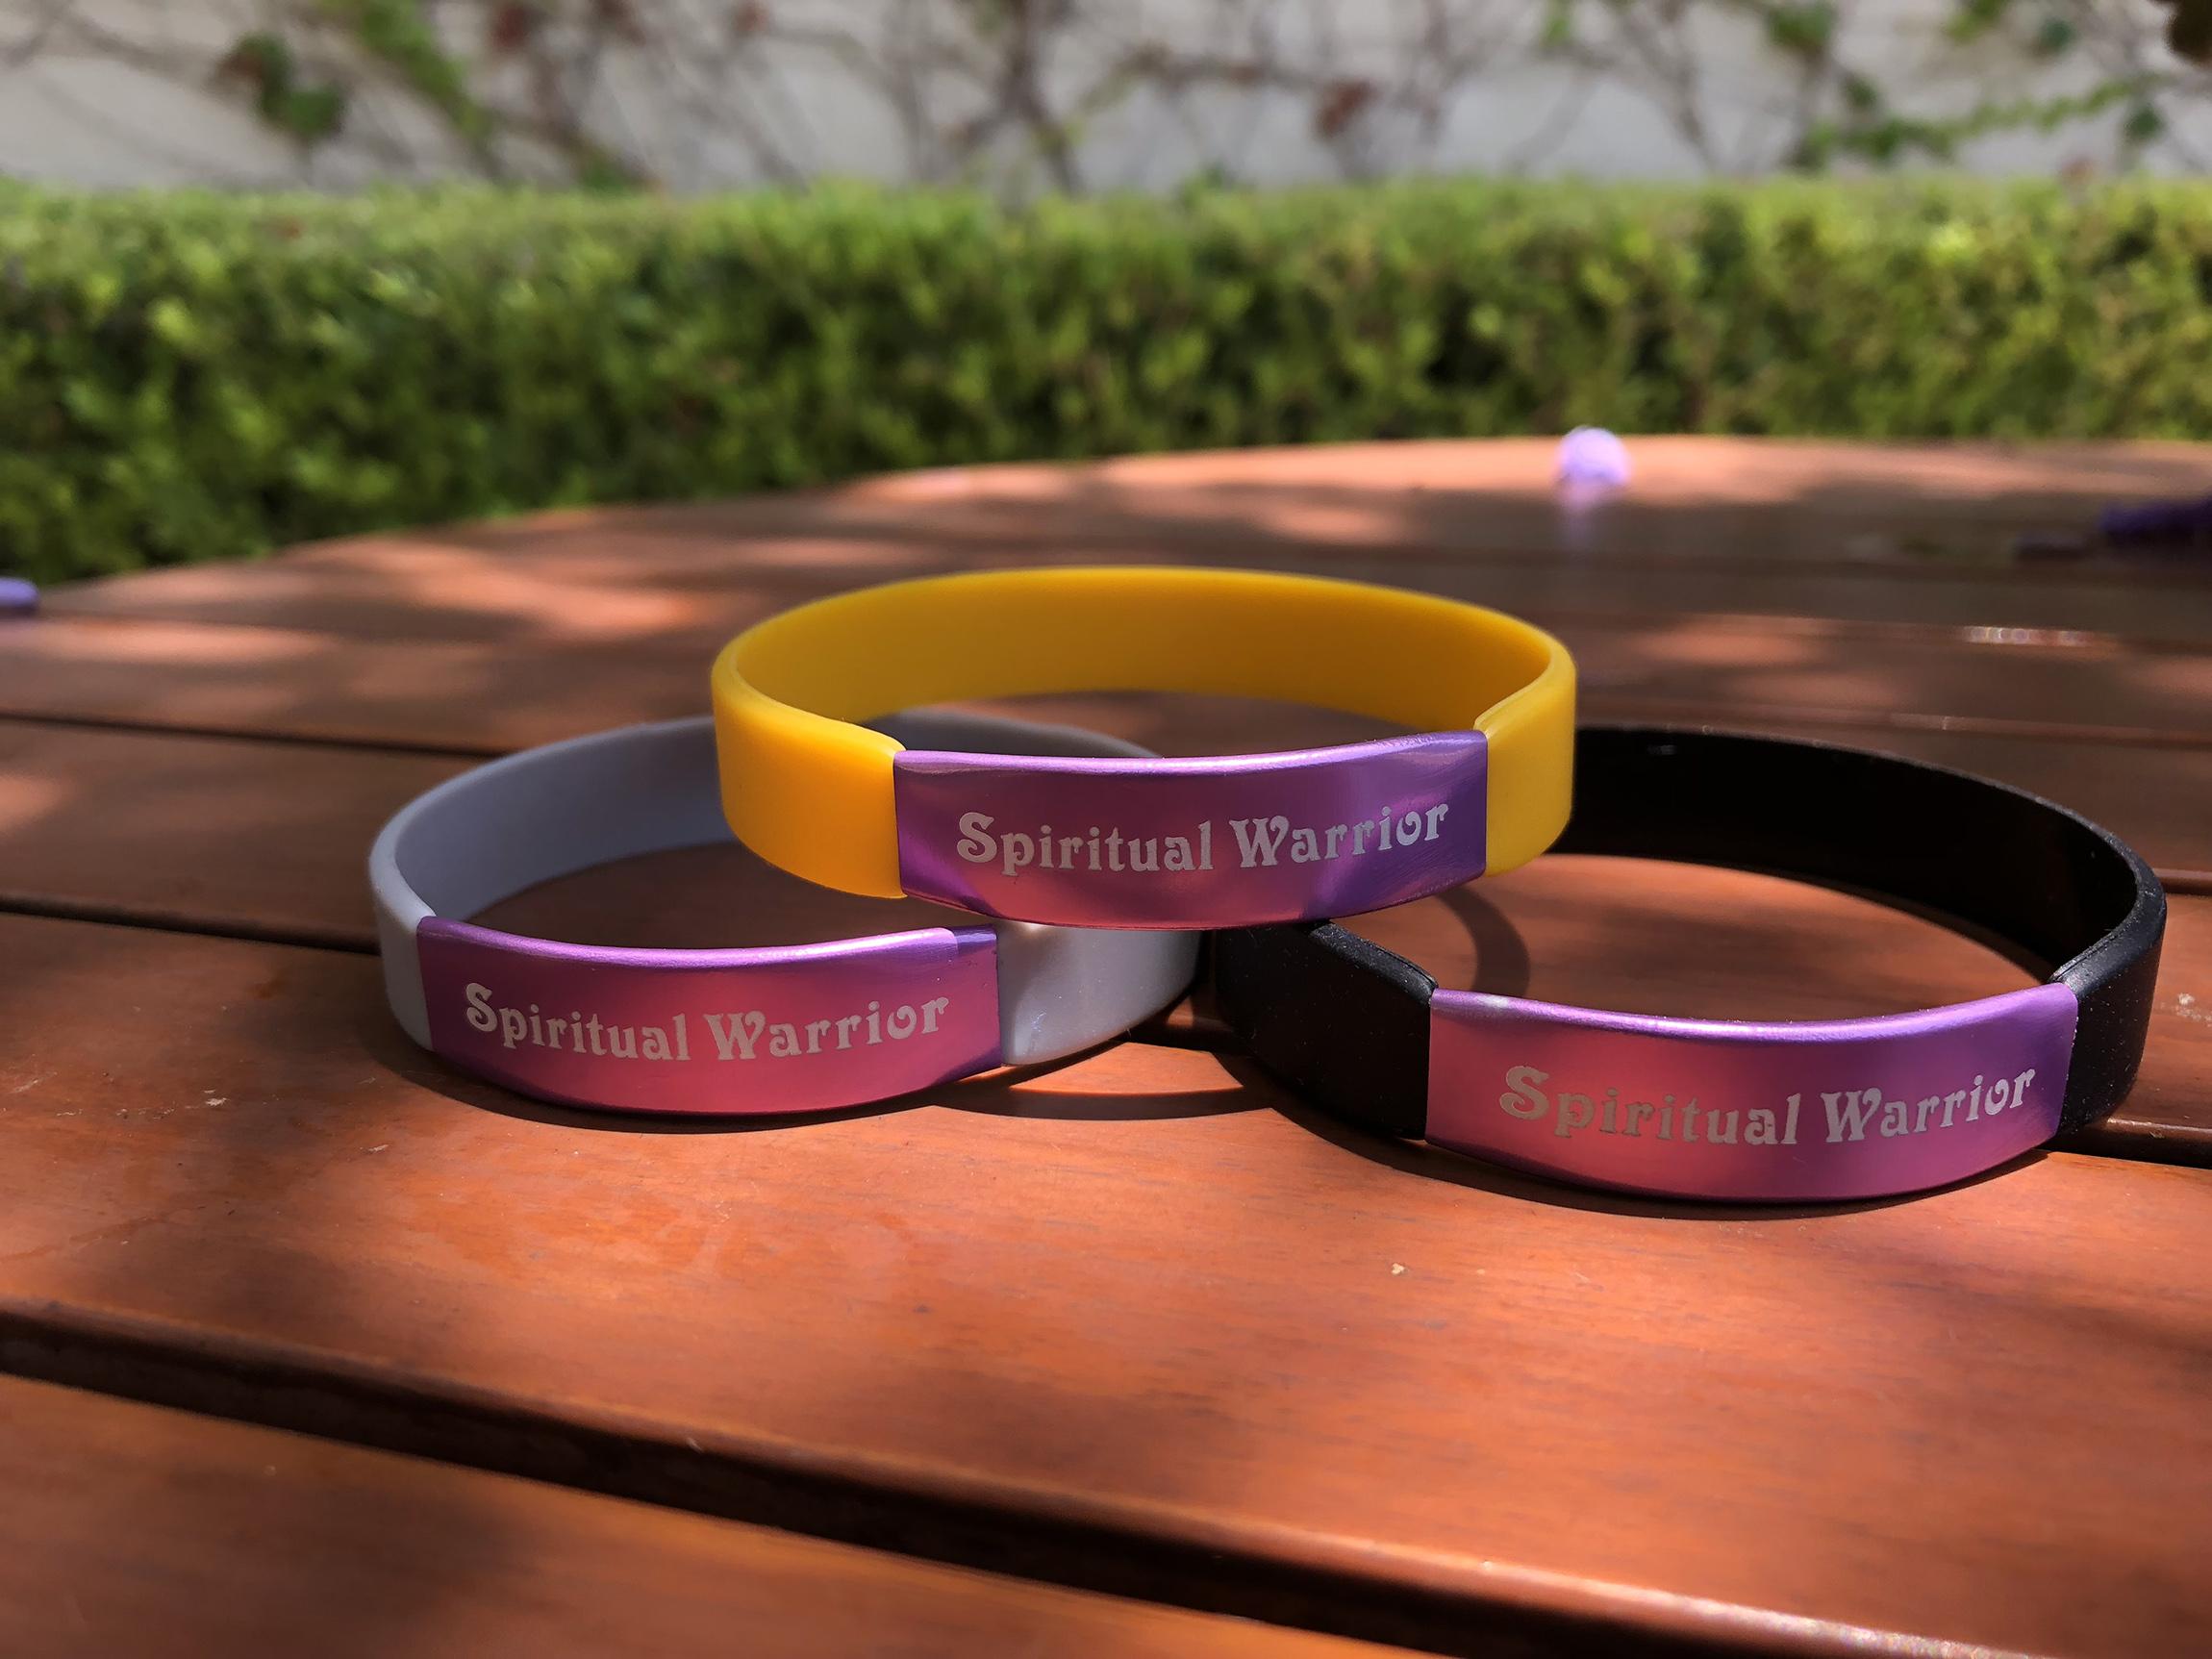 Spiritual Warrior Wristband Bracelets